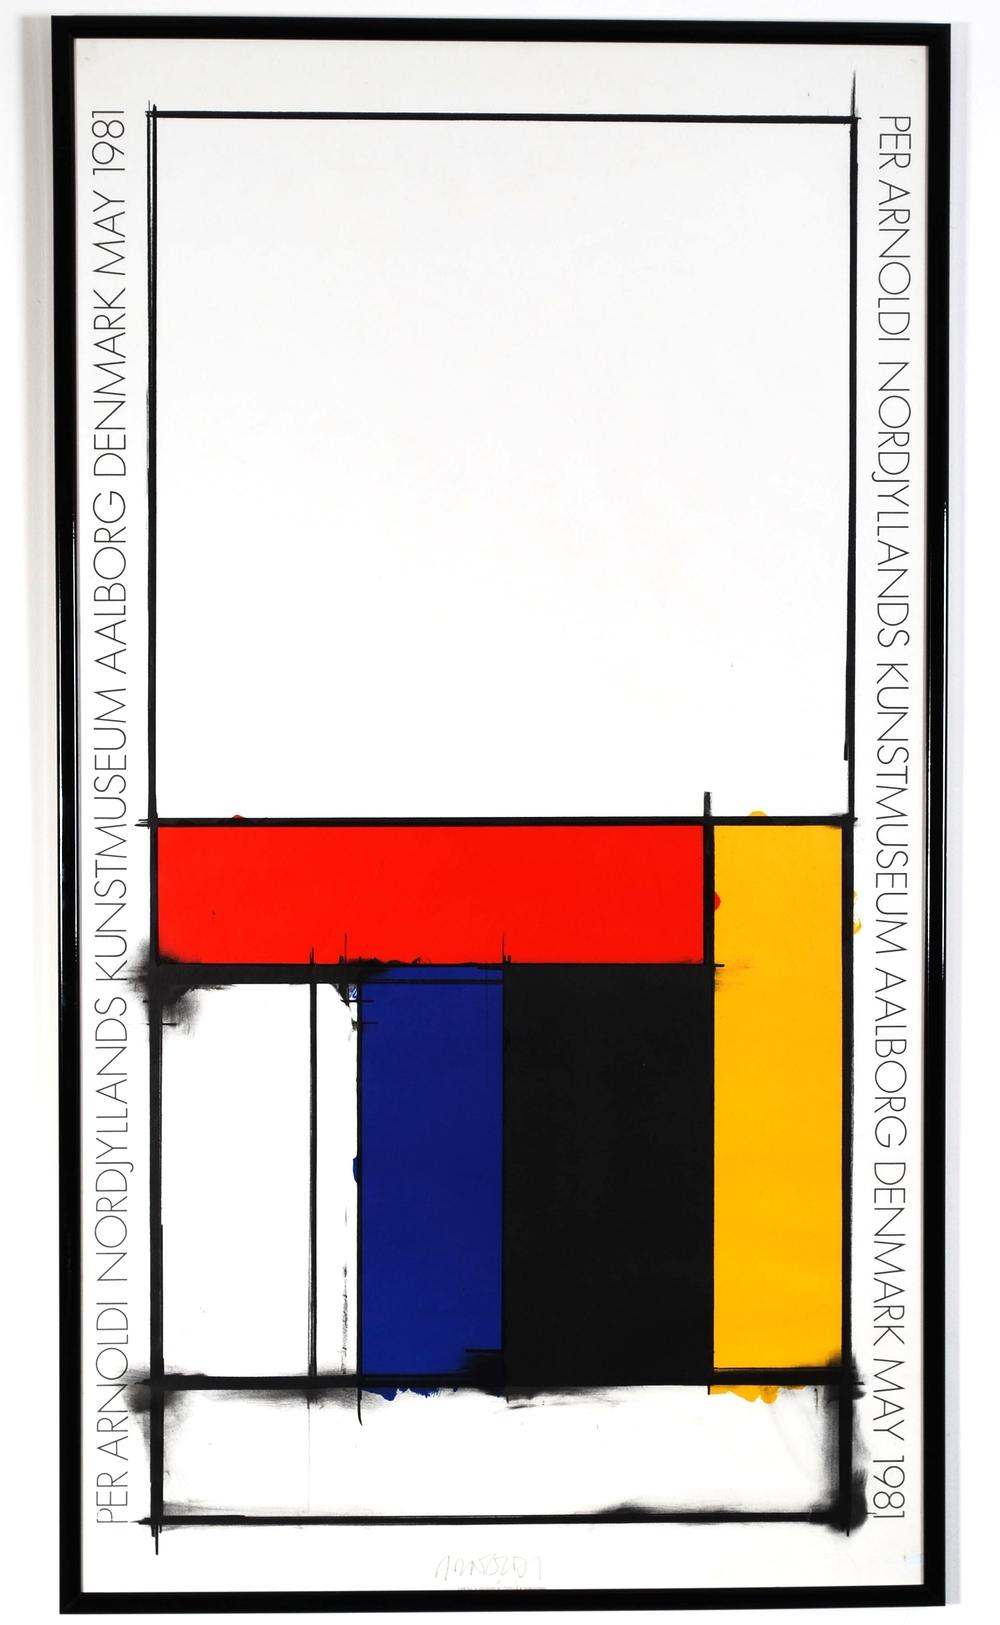 Original poster Per Arnoldi - Nordjyllands Kunstmuseum - Aalborg Denmark - 1981